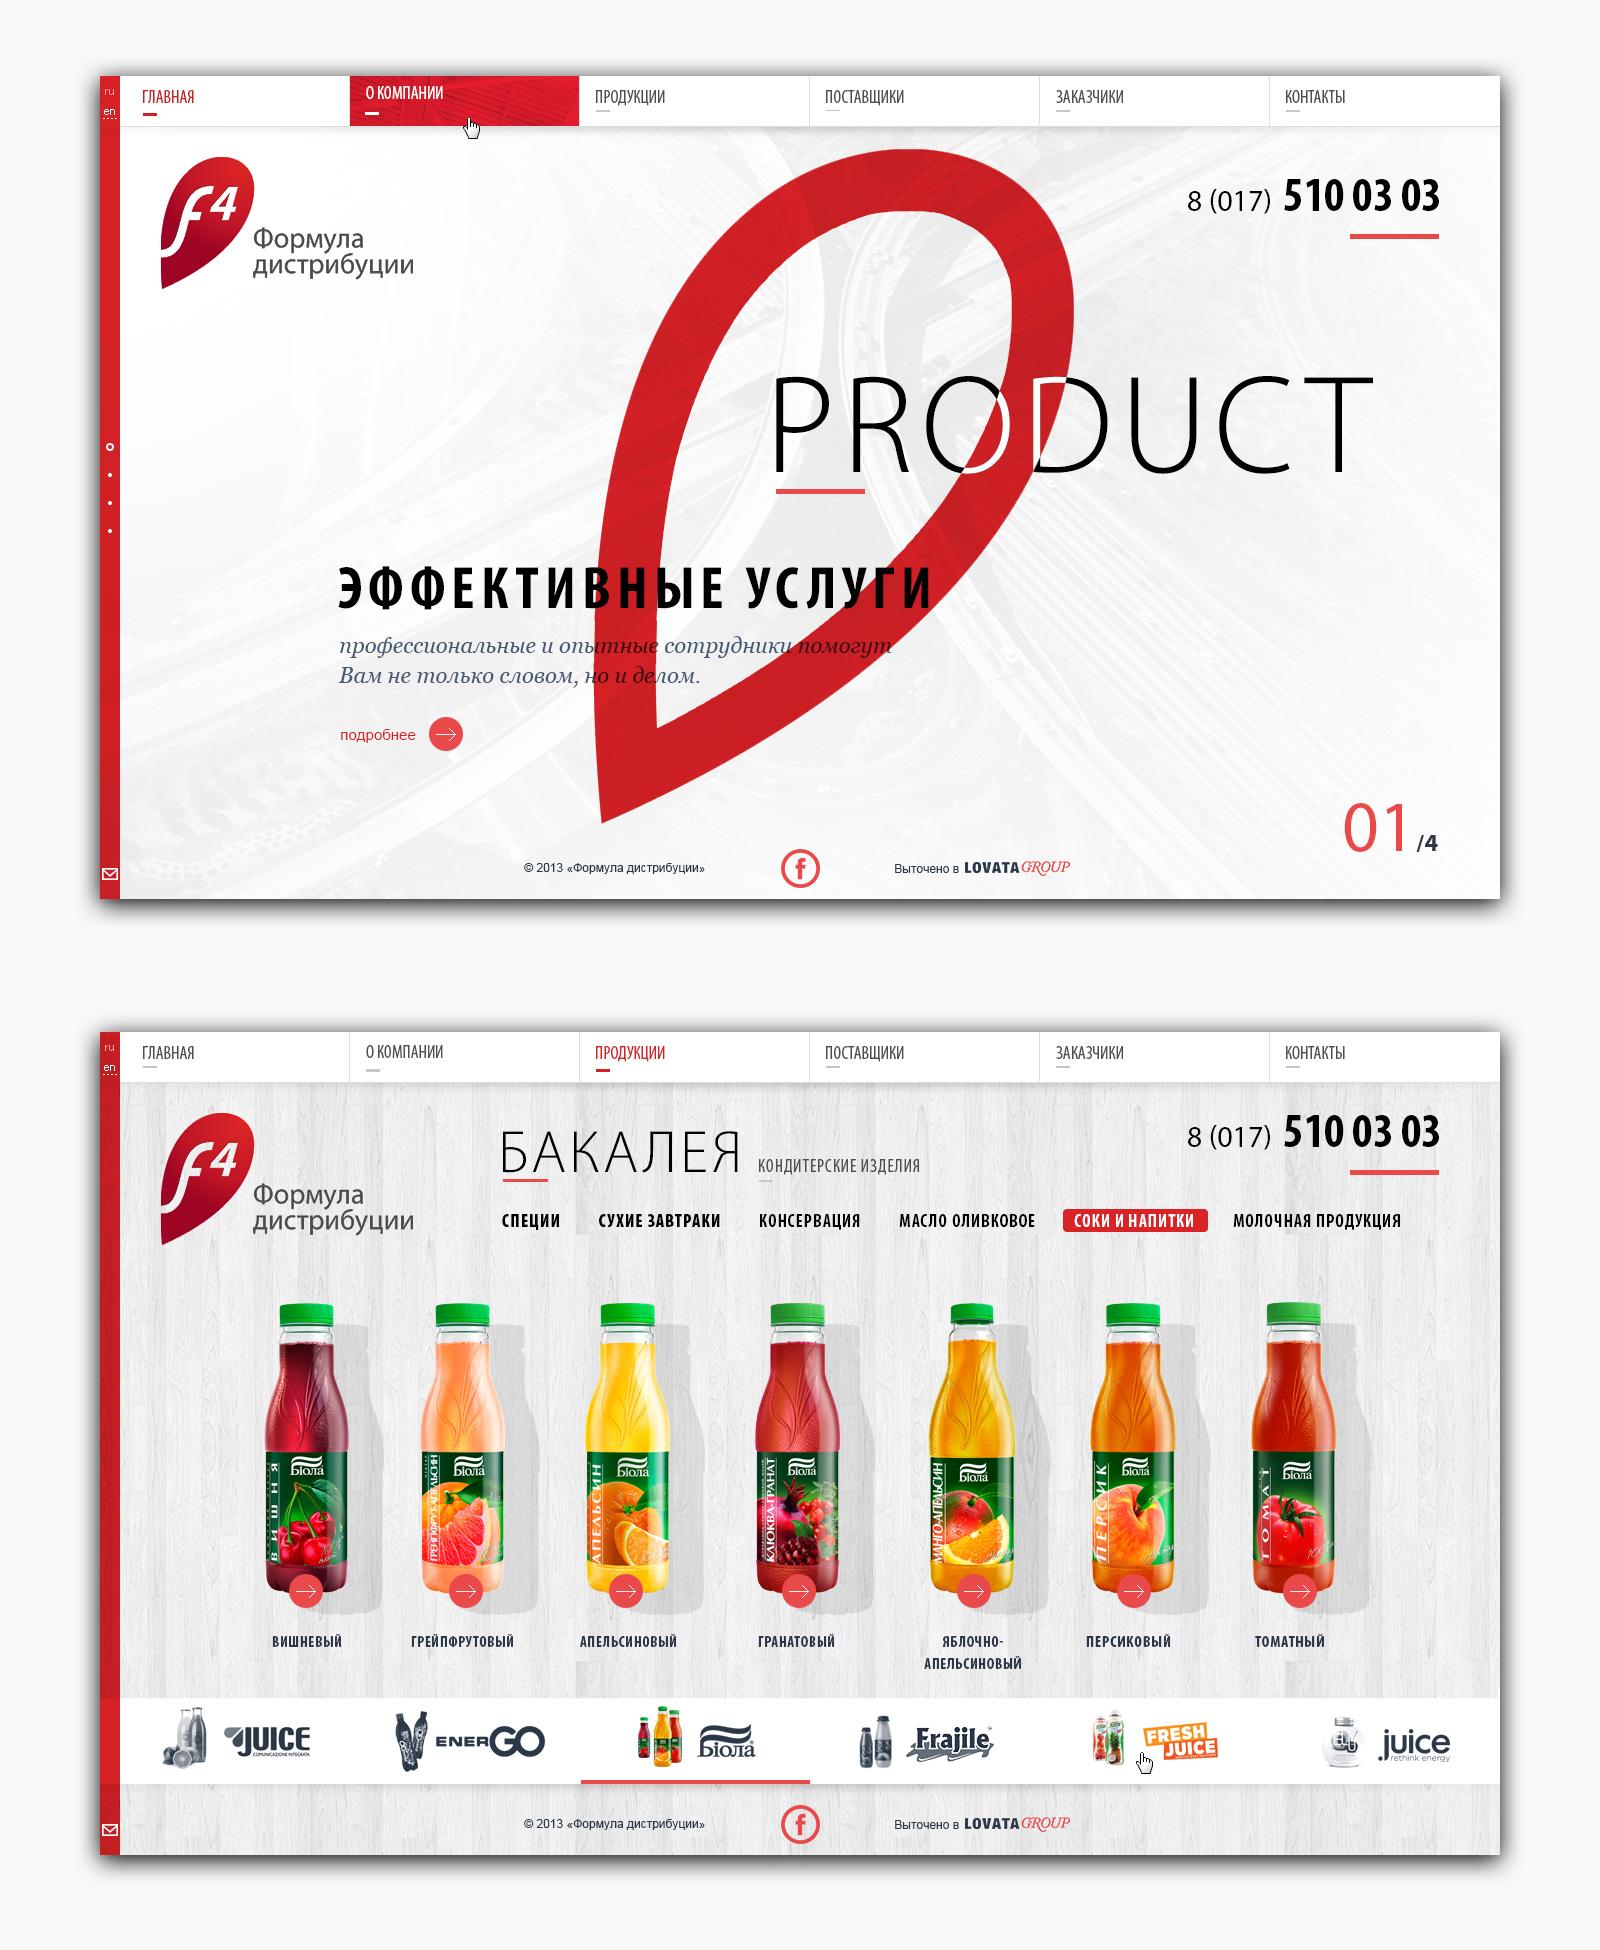 F4 company